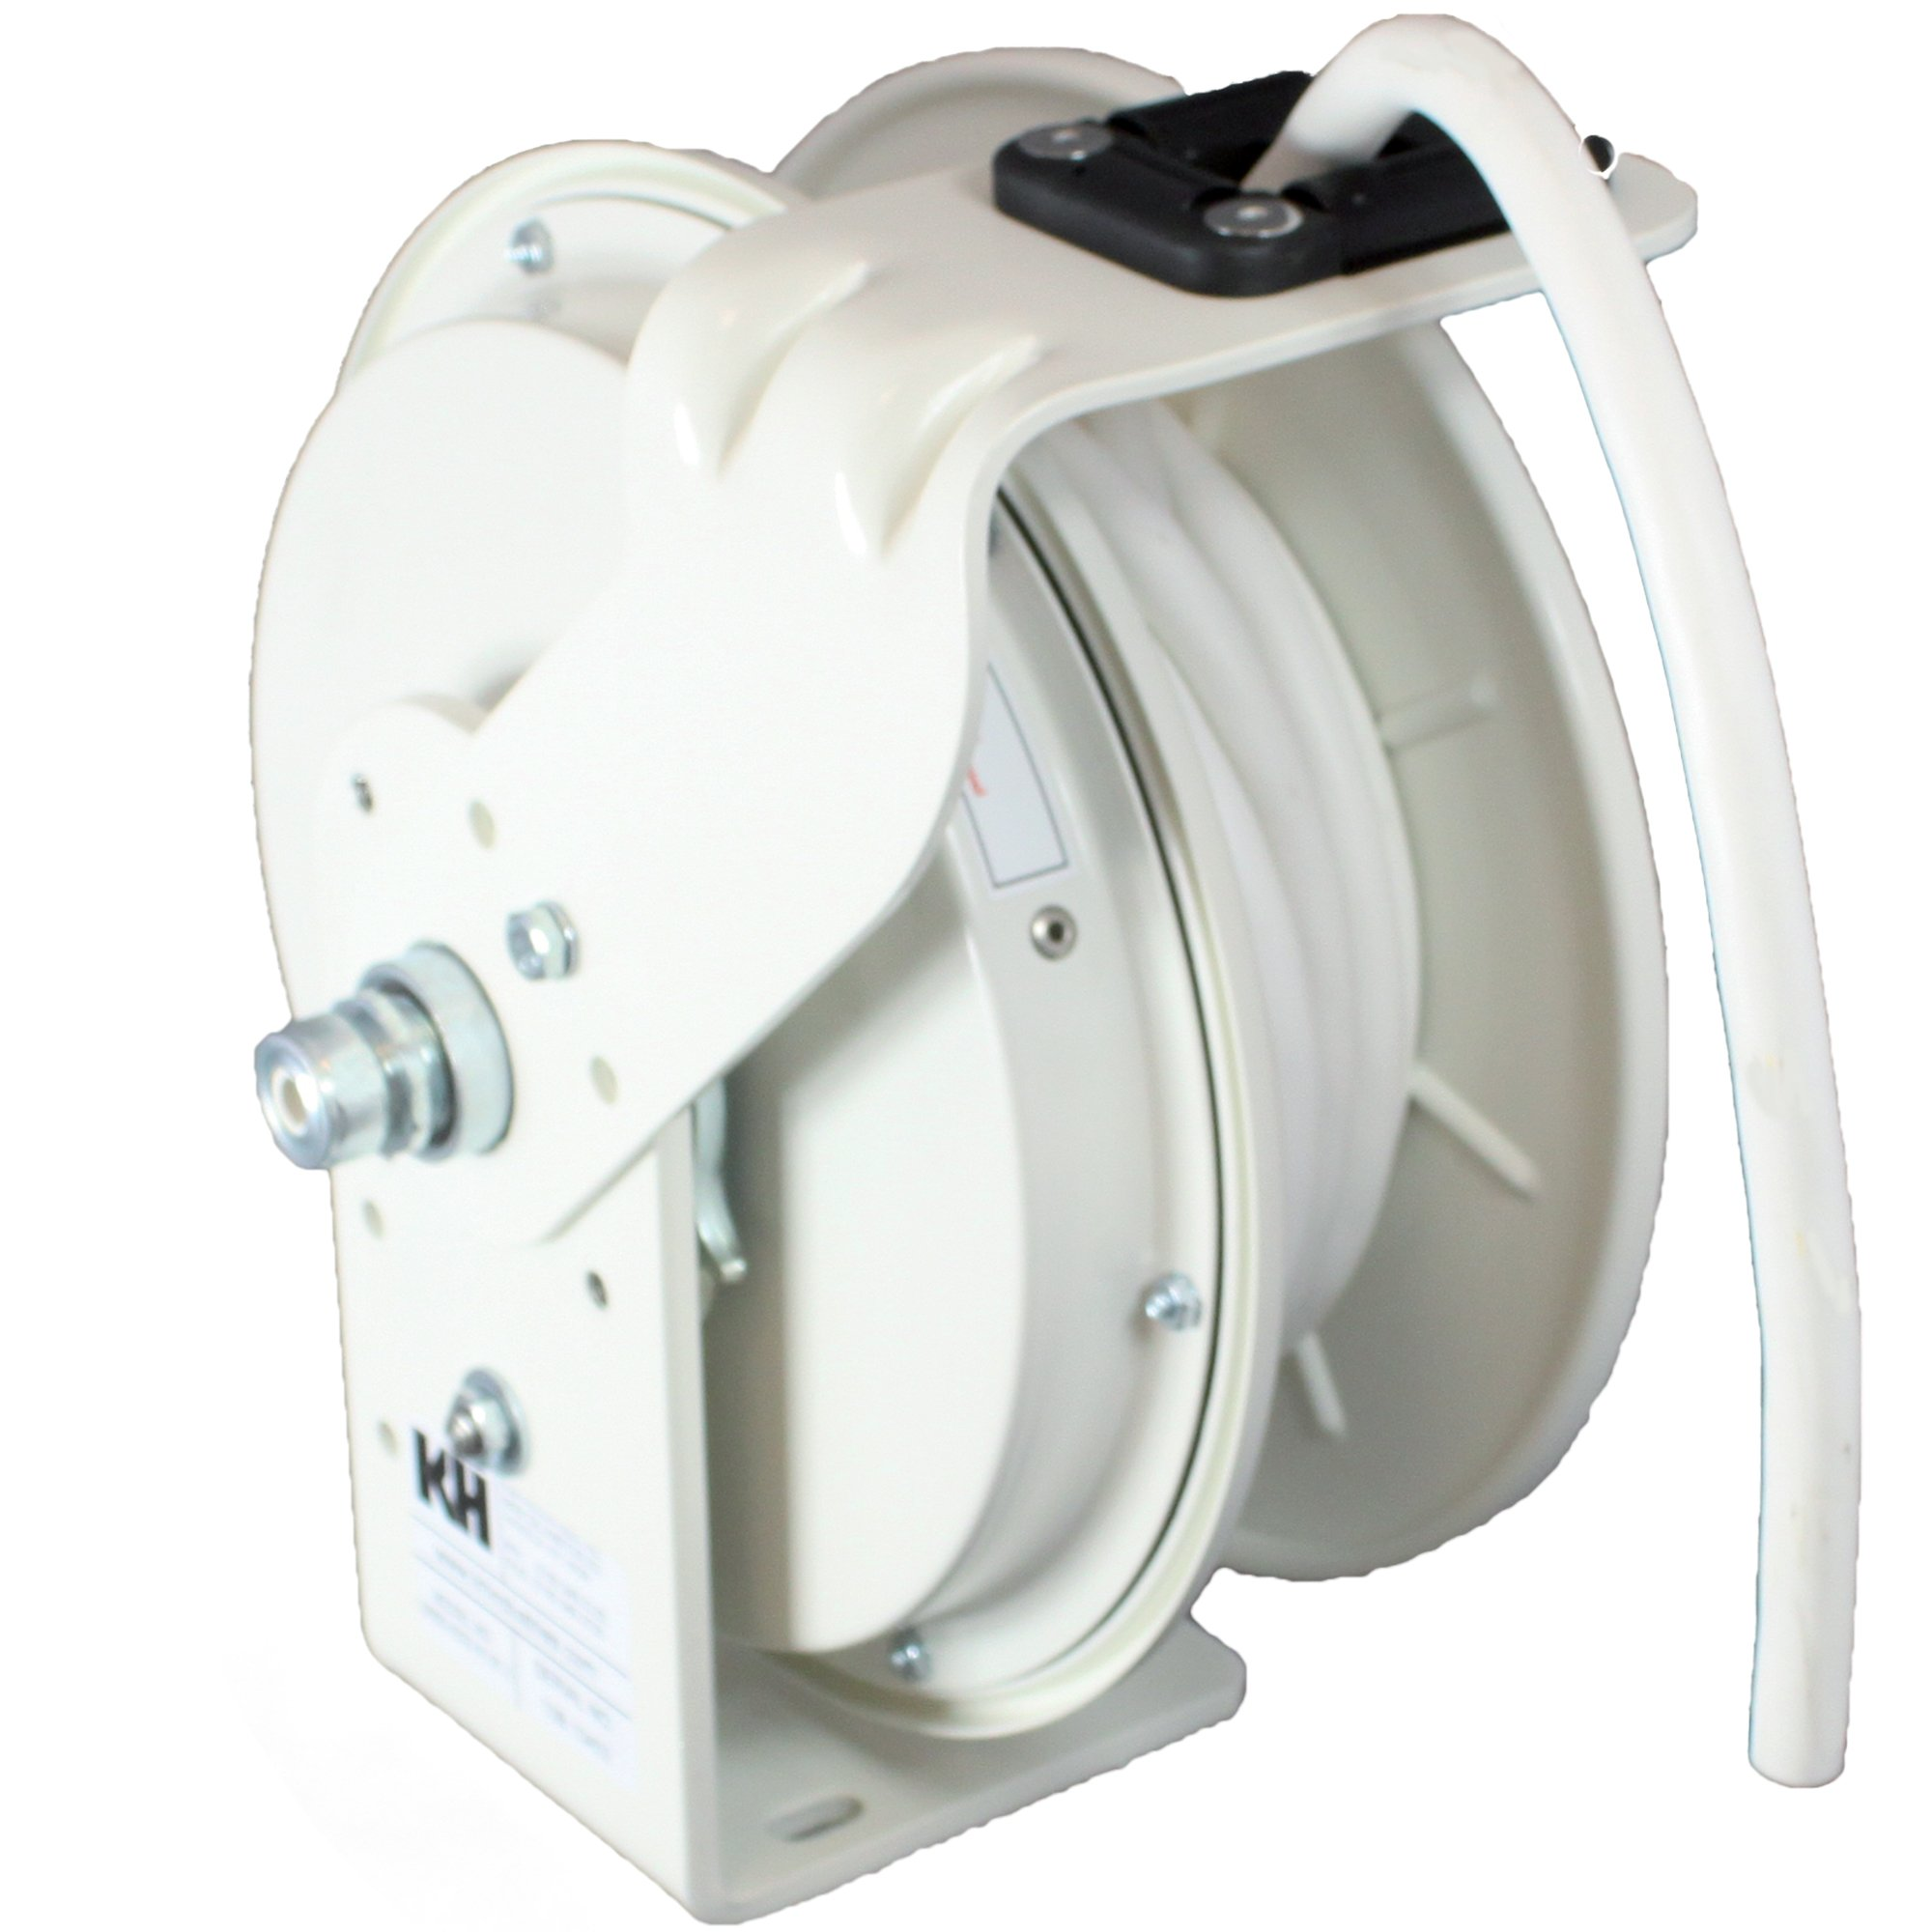 KH Industries RTB Series ReelTuff Power Cord Reel, 12/3 SJOW White Cable, 20 Amp, 25' Length, White Powder Coat Finish